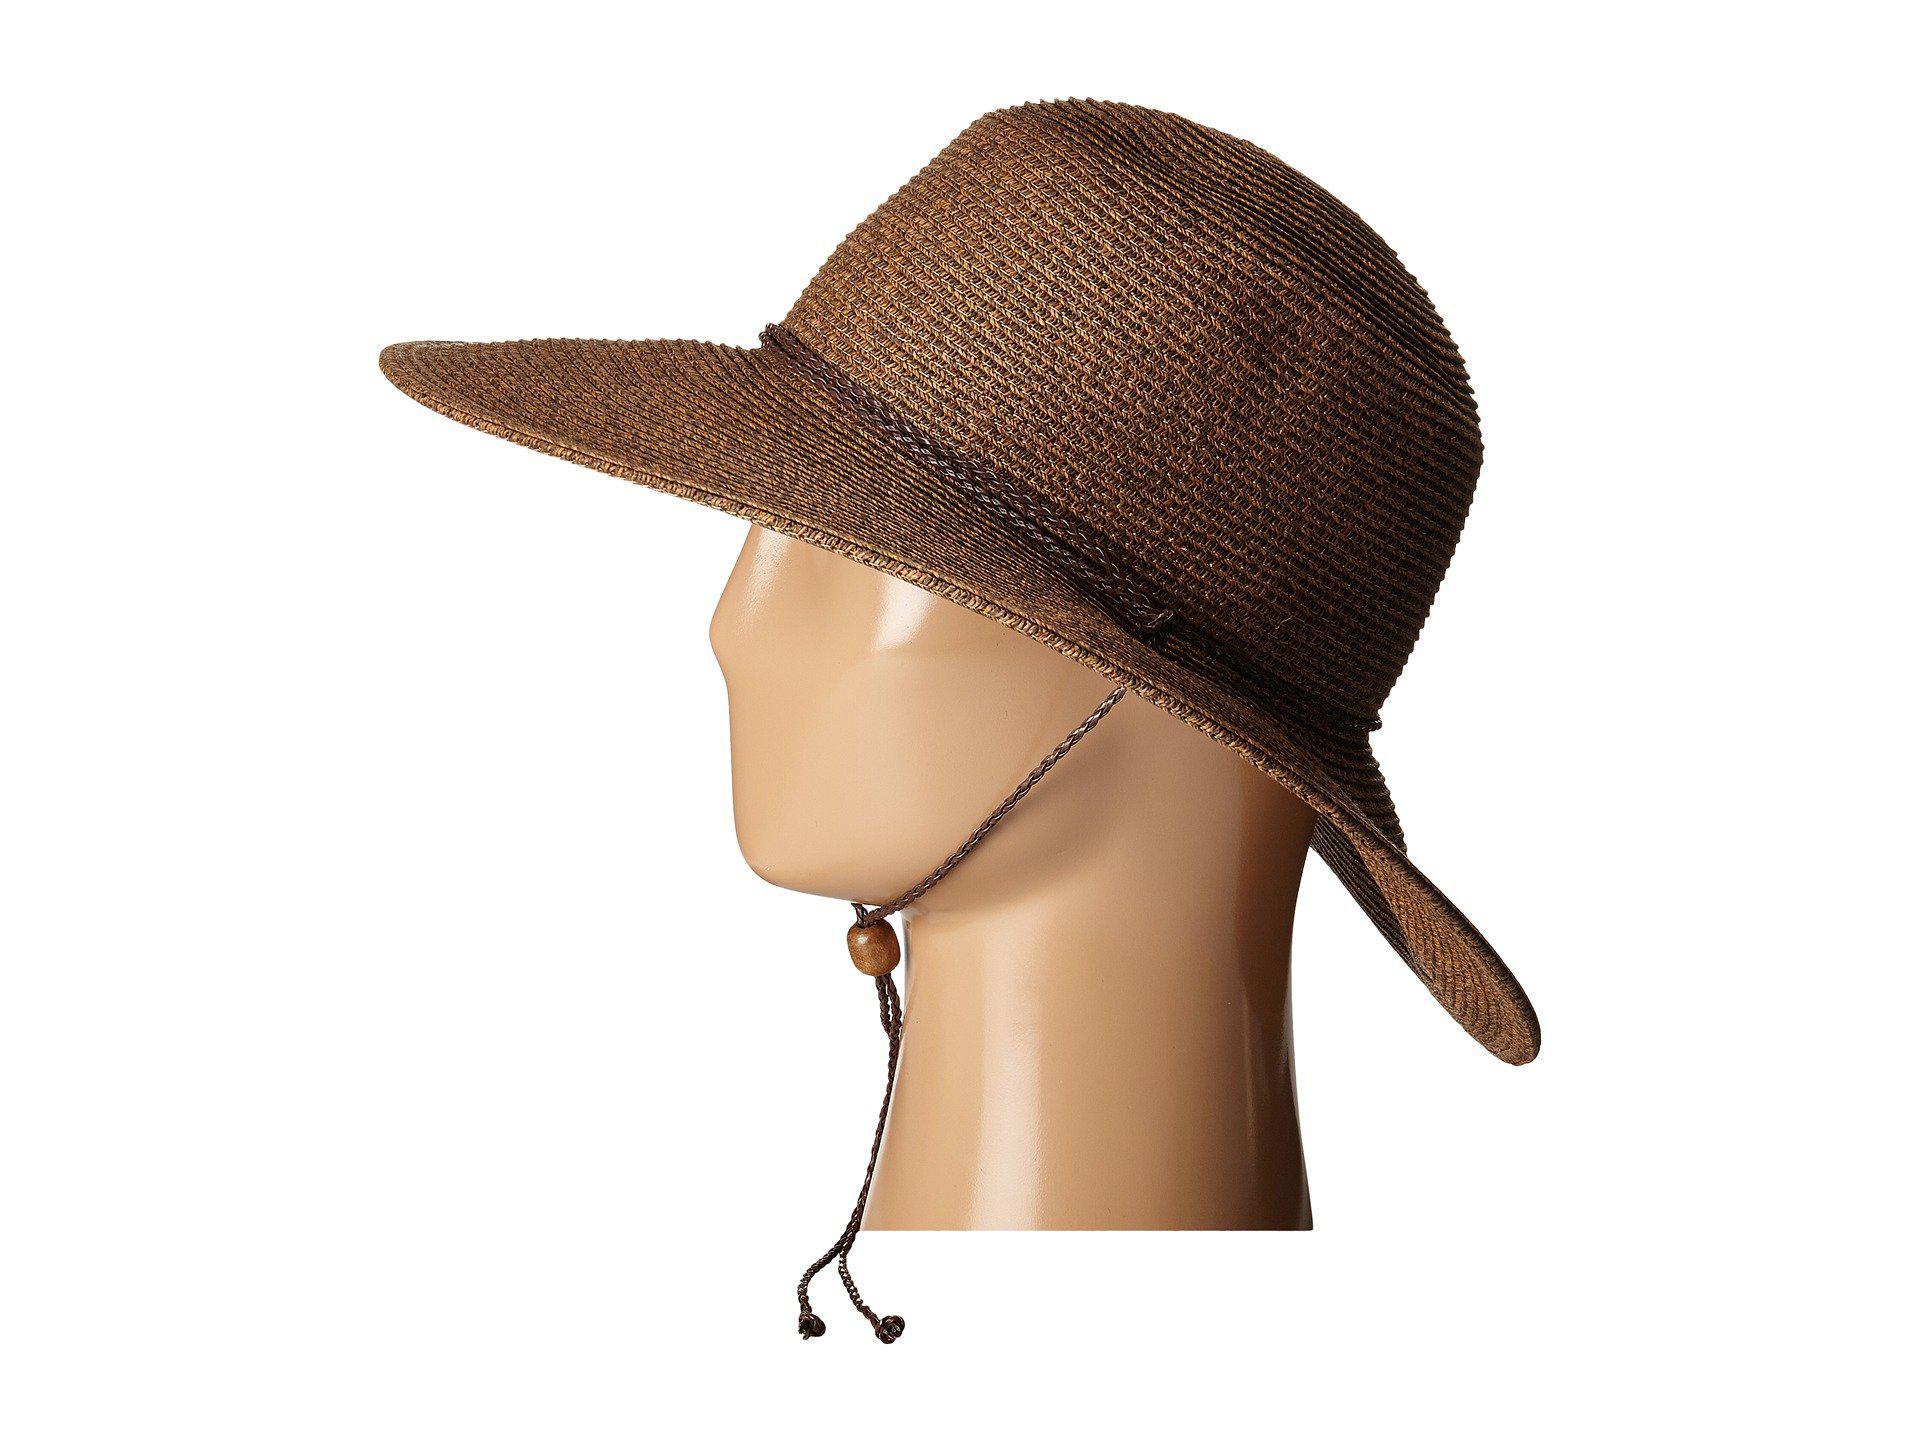 ... 4 Inch Brim Sun Hat With Twisted Adjustable Chin Cord. View fullscreen 792fa85542b